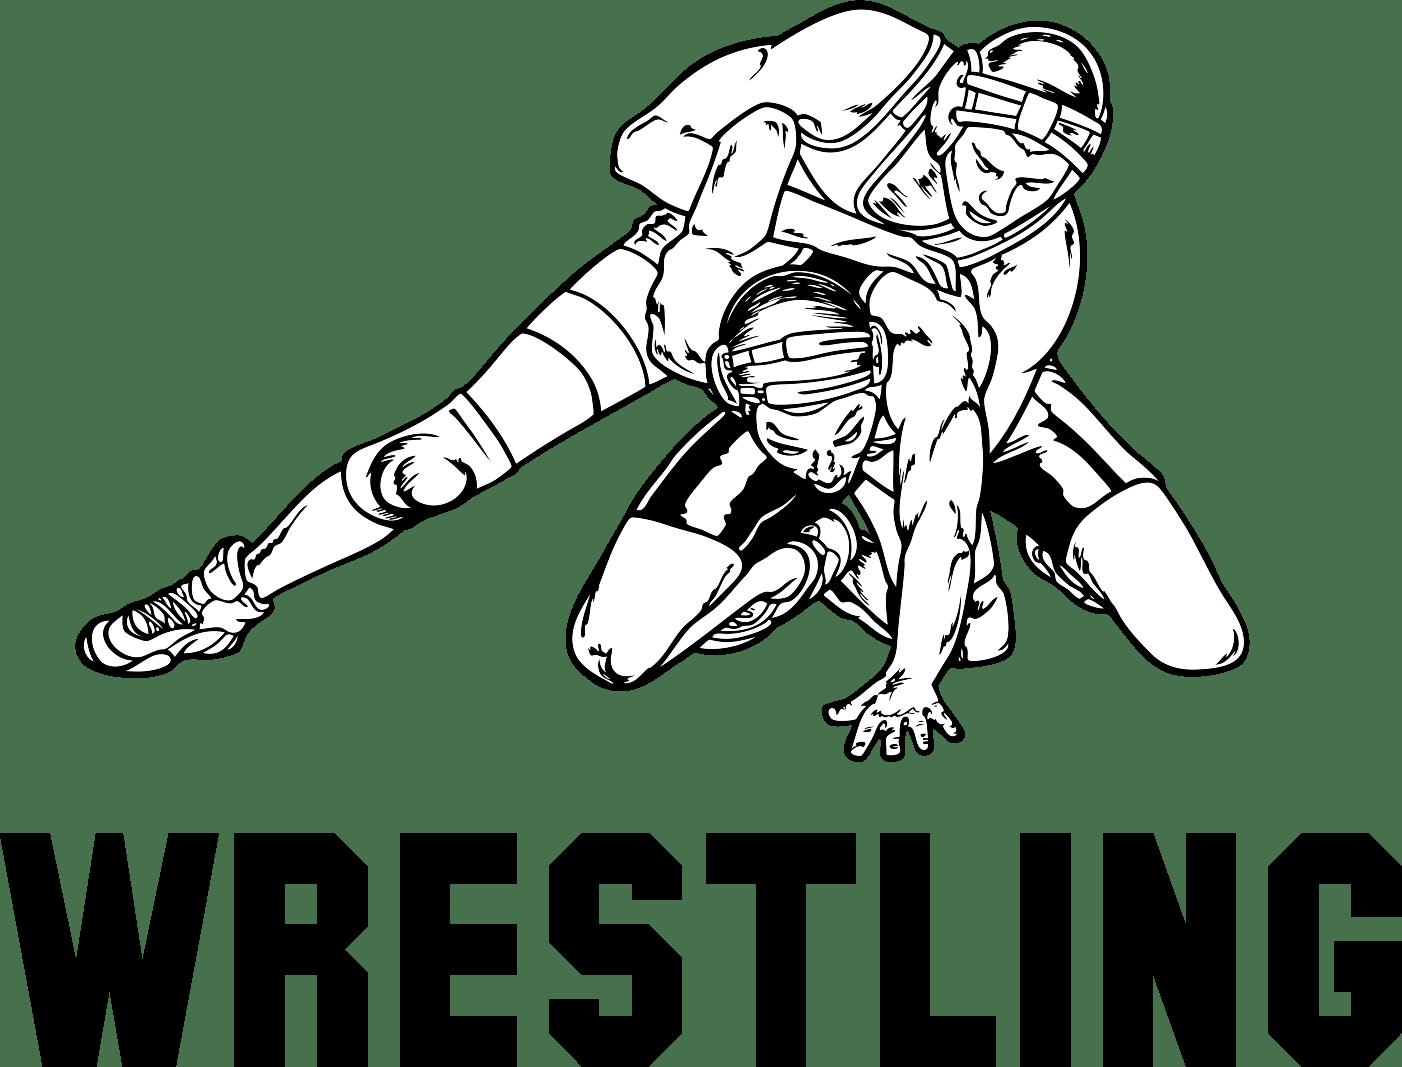 Wrestlers Clipart Stance Wrestlers Stance Transparent